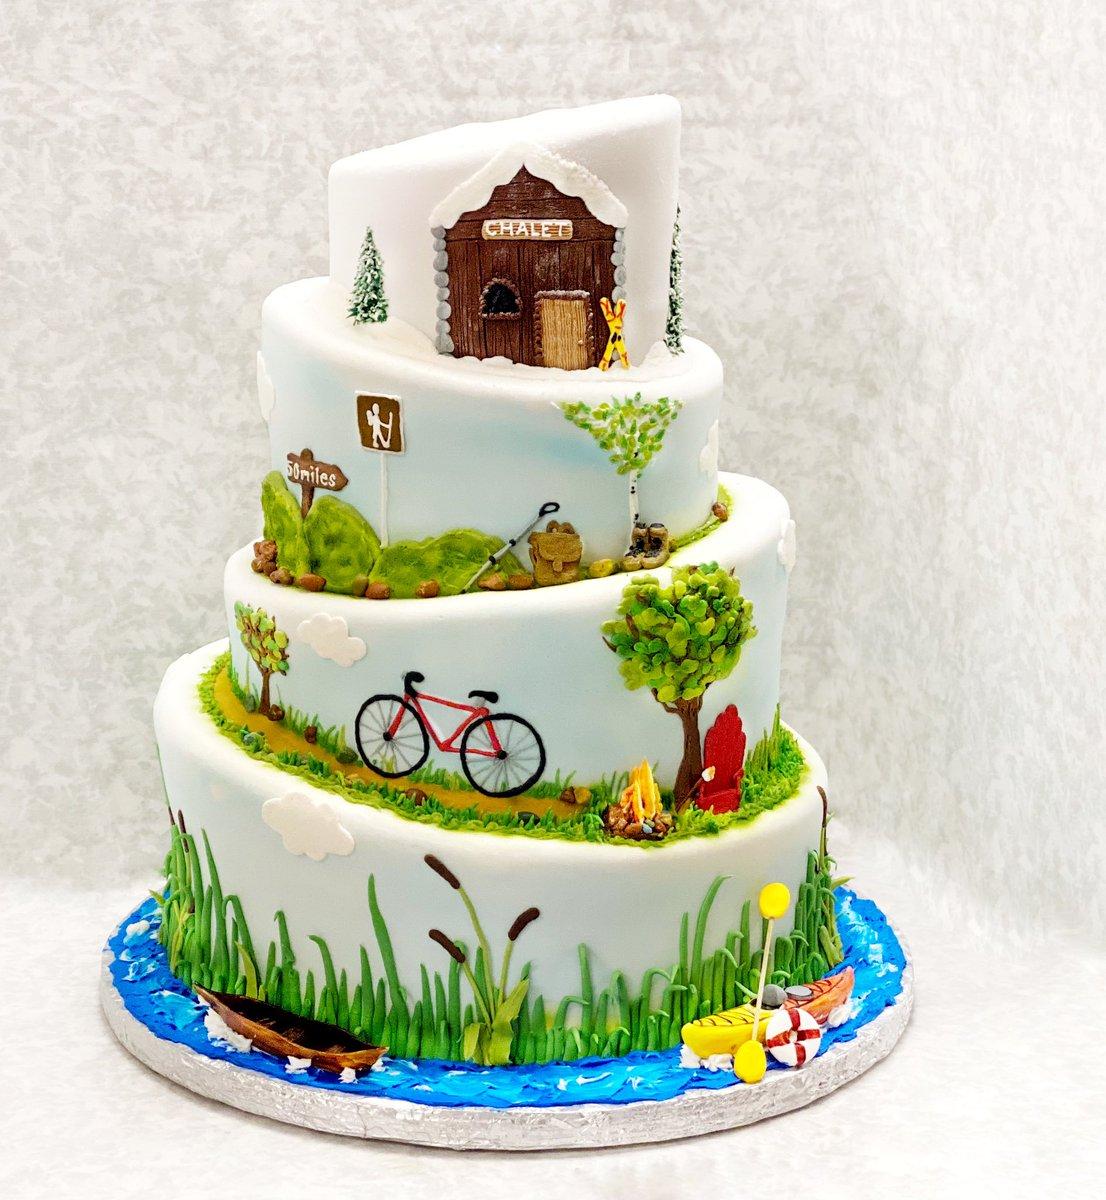 The outdoor lovers' dream cake!  • • • • • #queenofcakes #queenofcakesdidmycookies #queenofcakesdidmycake #cakelove #buttercreamart #mycakeobsession #birthdaycakes #weddingcakes #babyshowercakes #minnesotabride #minnesotaweddings #outdoorcakes #topsyturvycakes #campingpic.twitter.com/Q5CYQq0nun